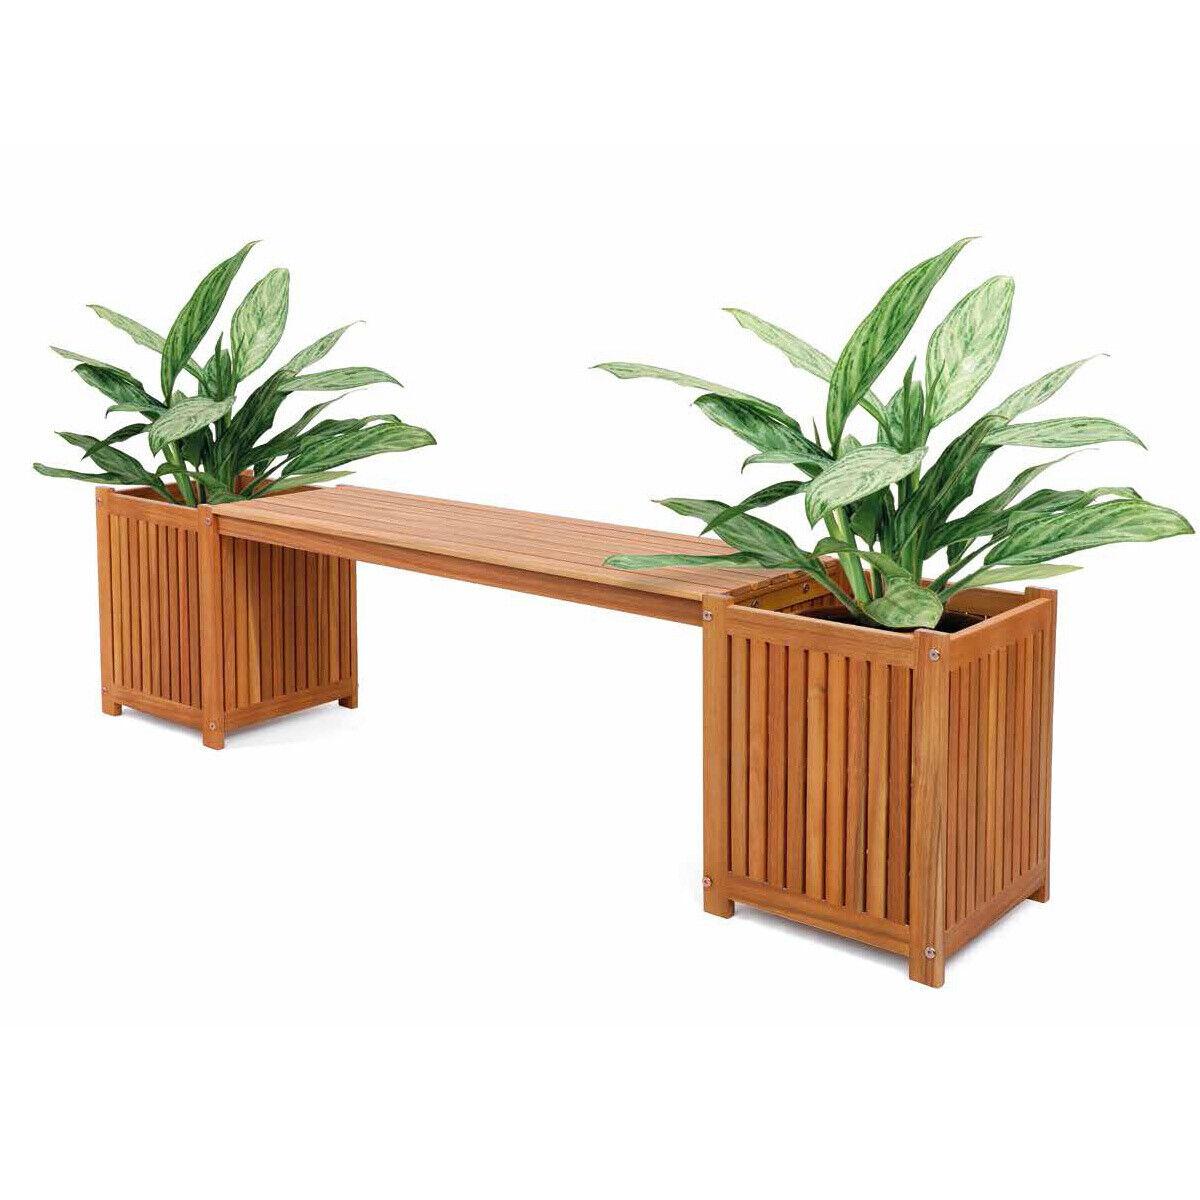 Garden Furniture - Bench Seat with Planter Boxes Outdoor Deck Garden Furniture Acacia Wood Natural